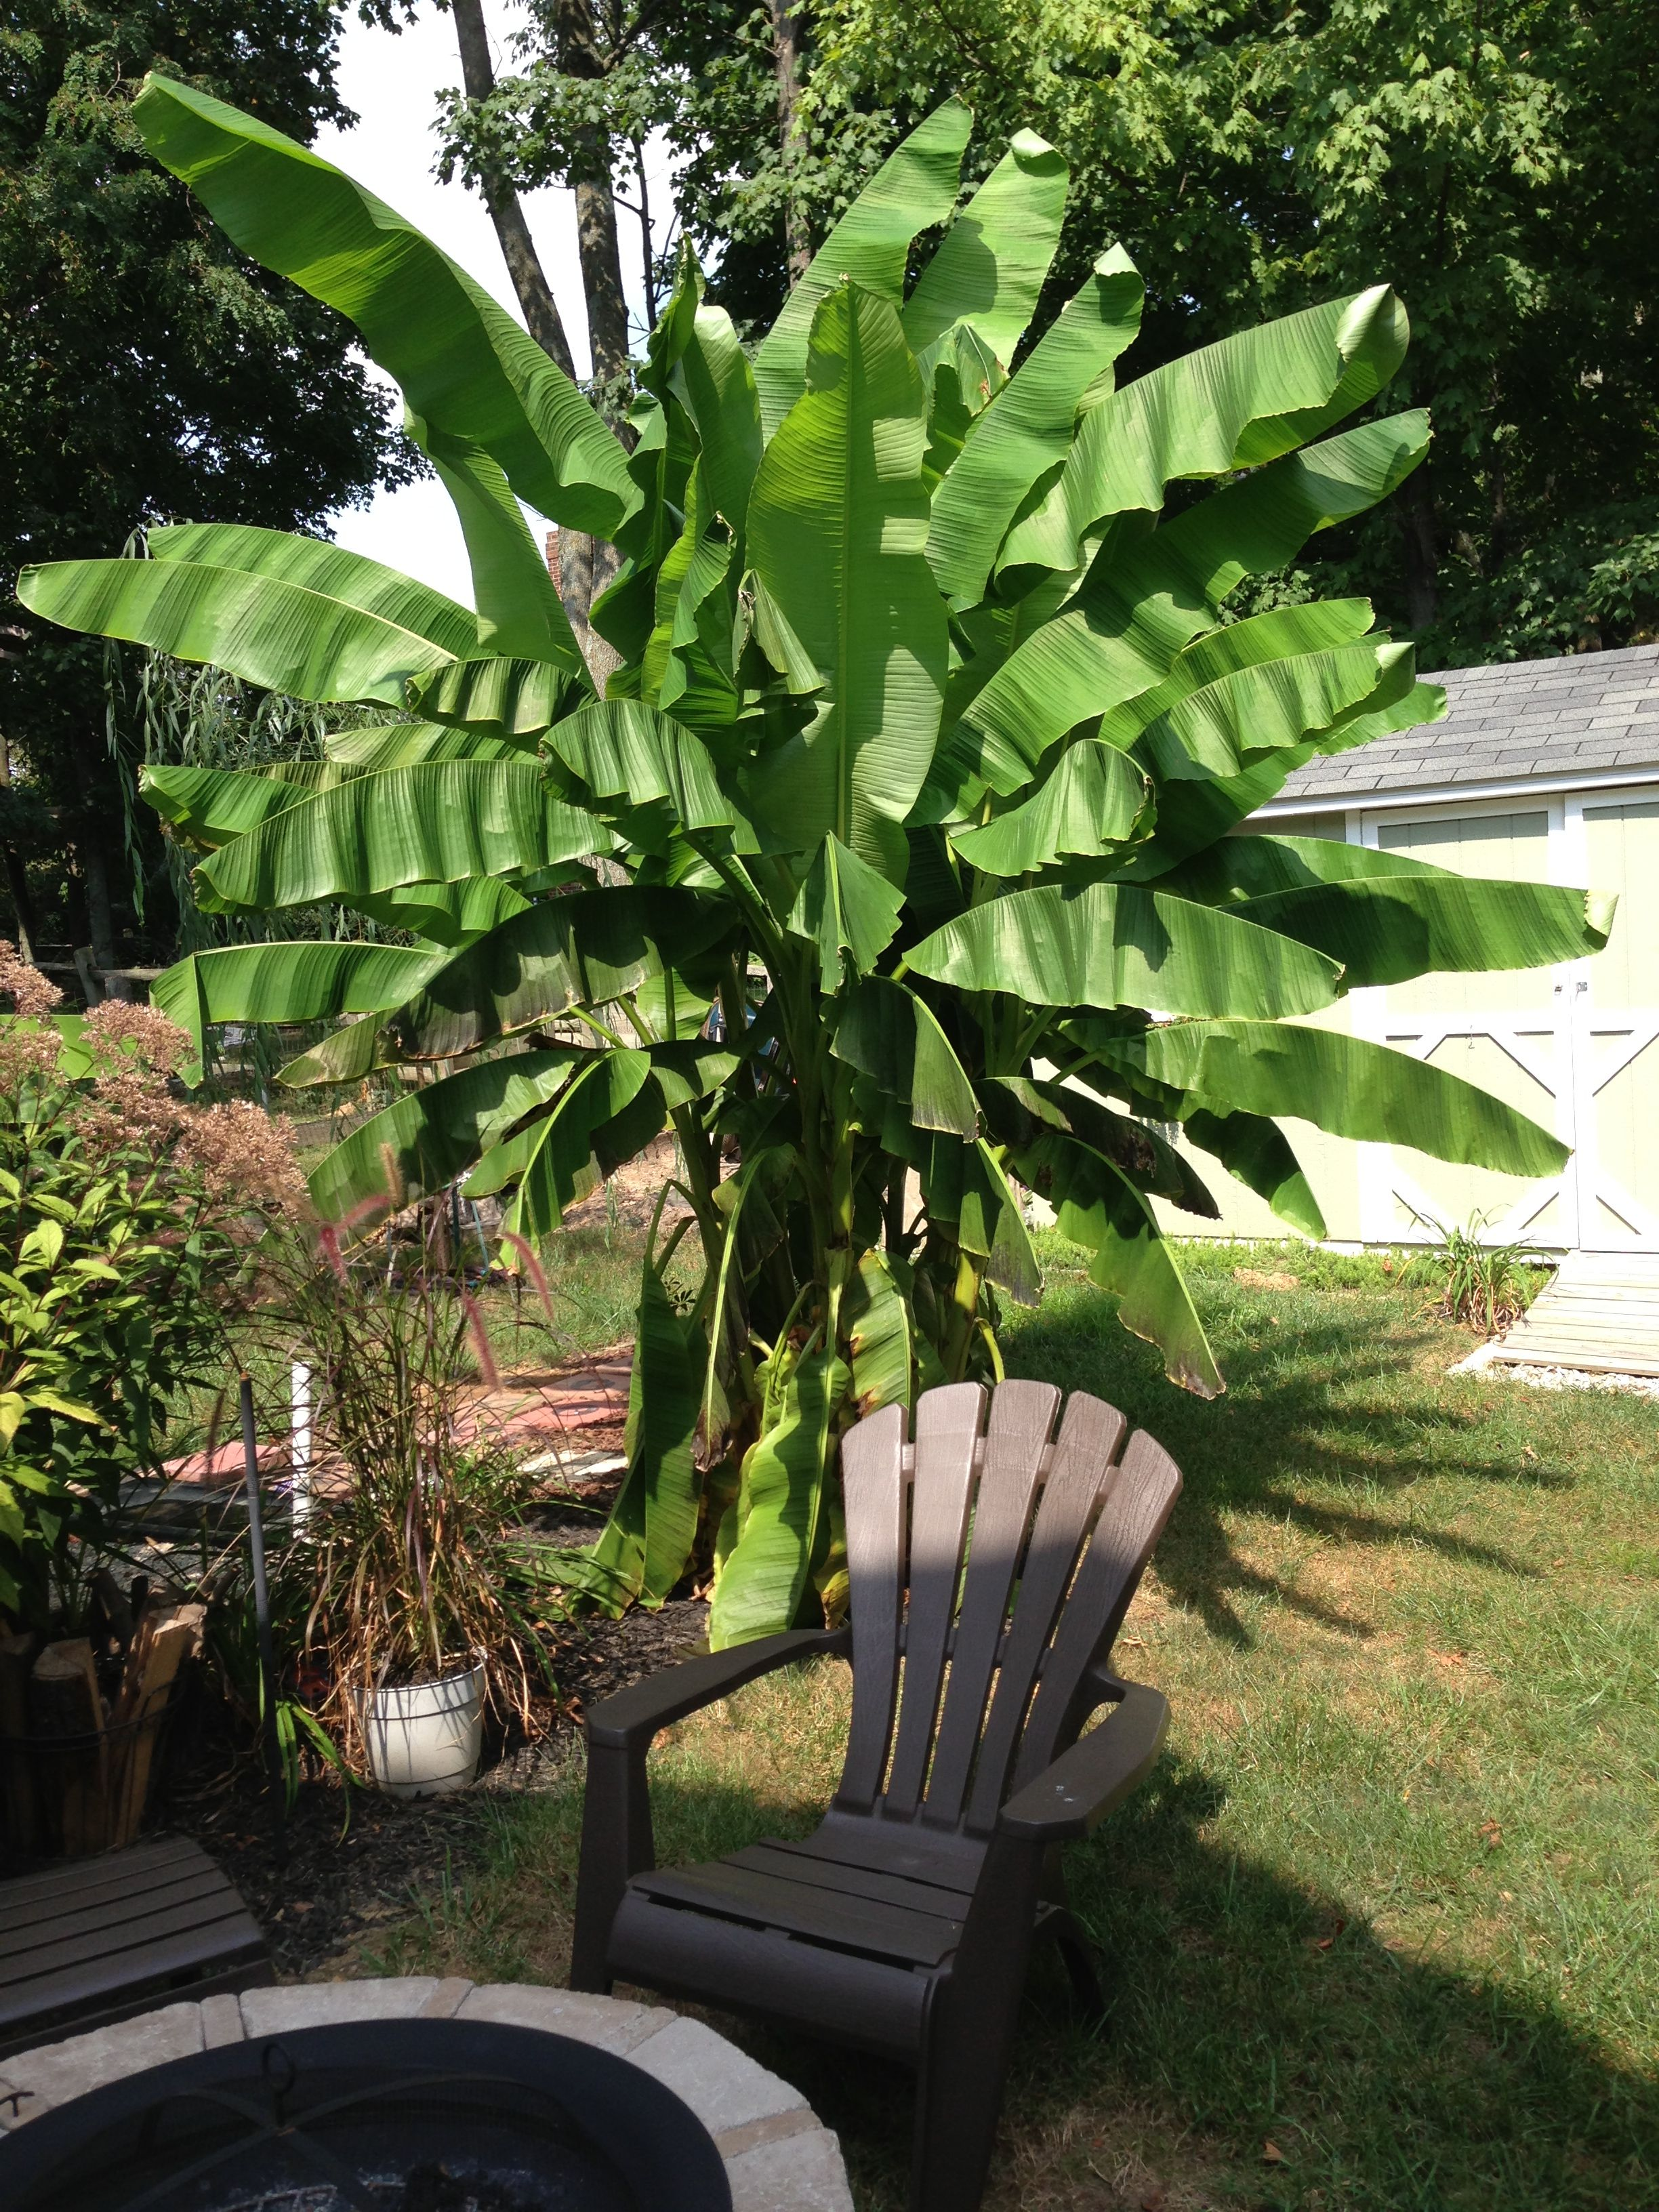 Monster Musa Basjoo Banana Plant In Zone 6